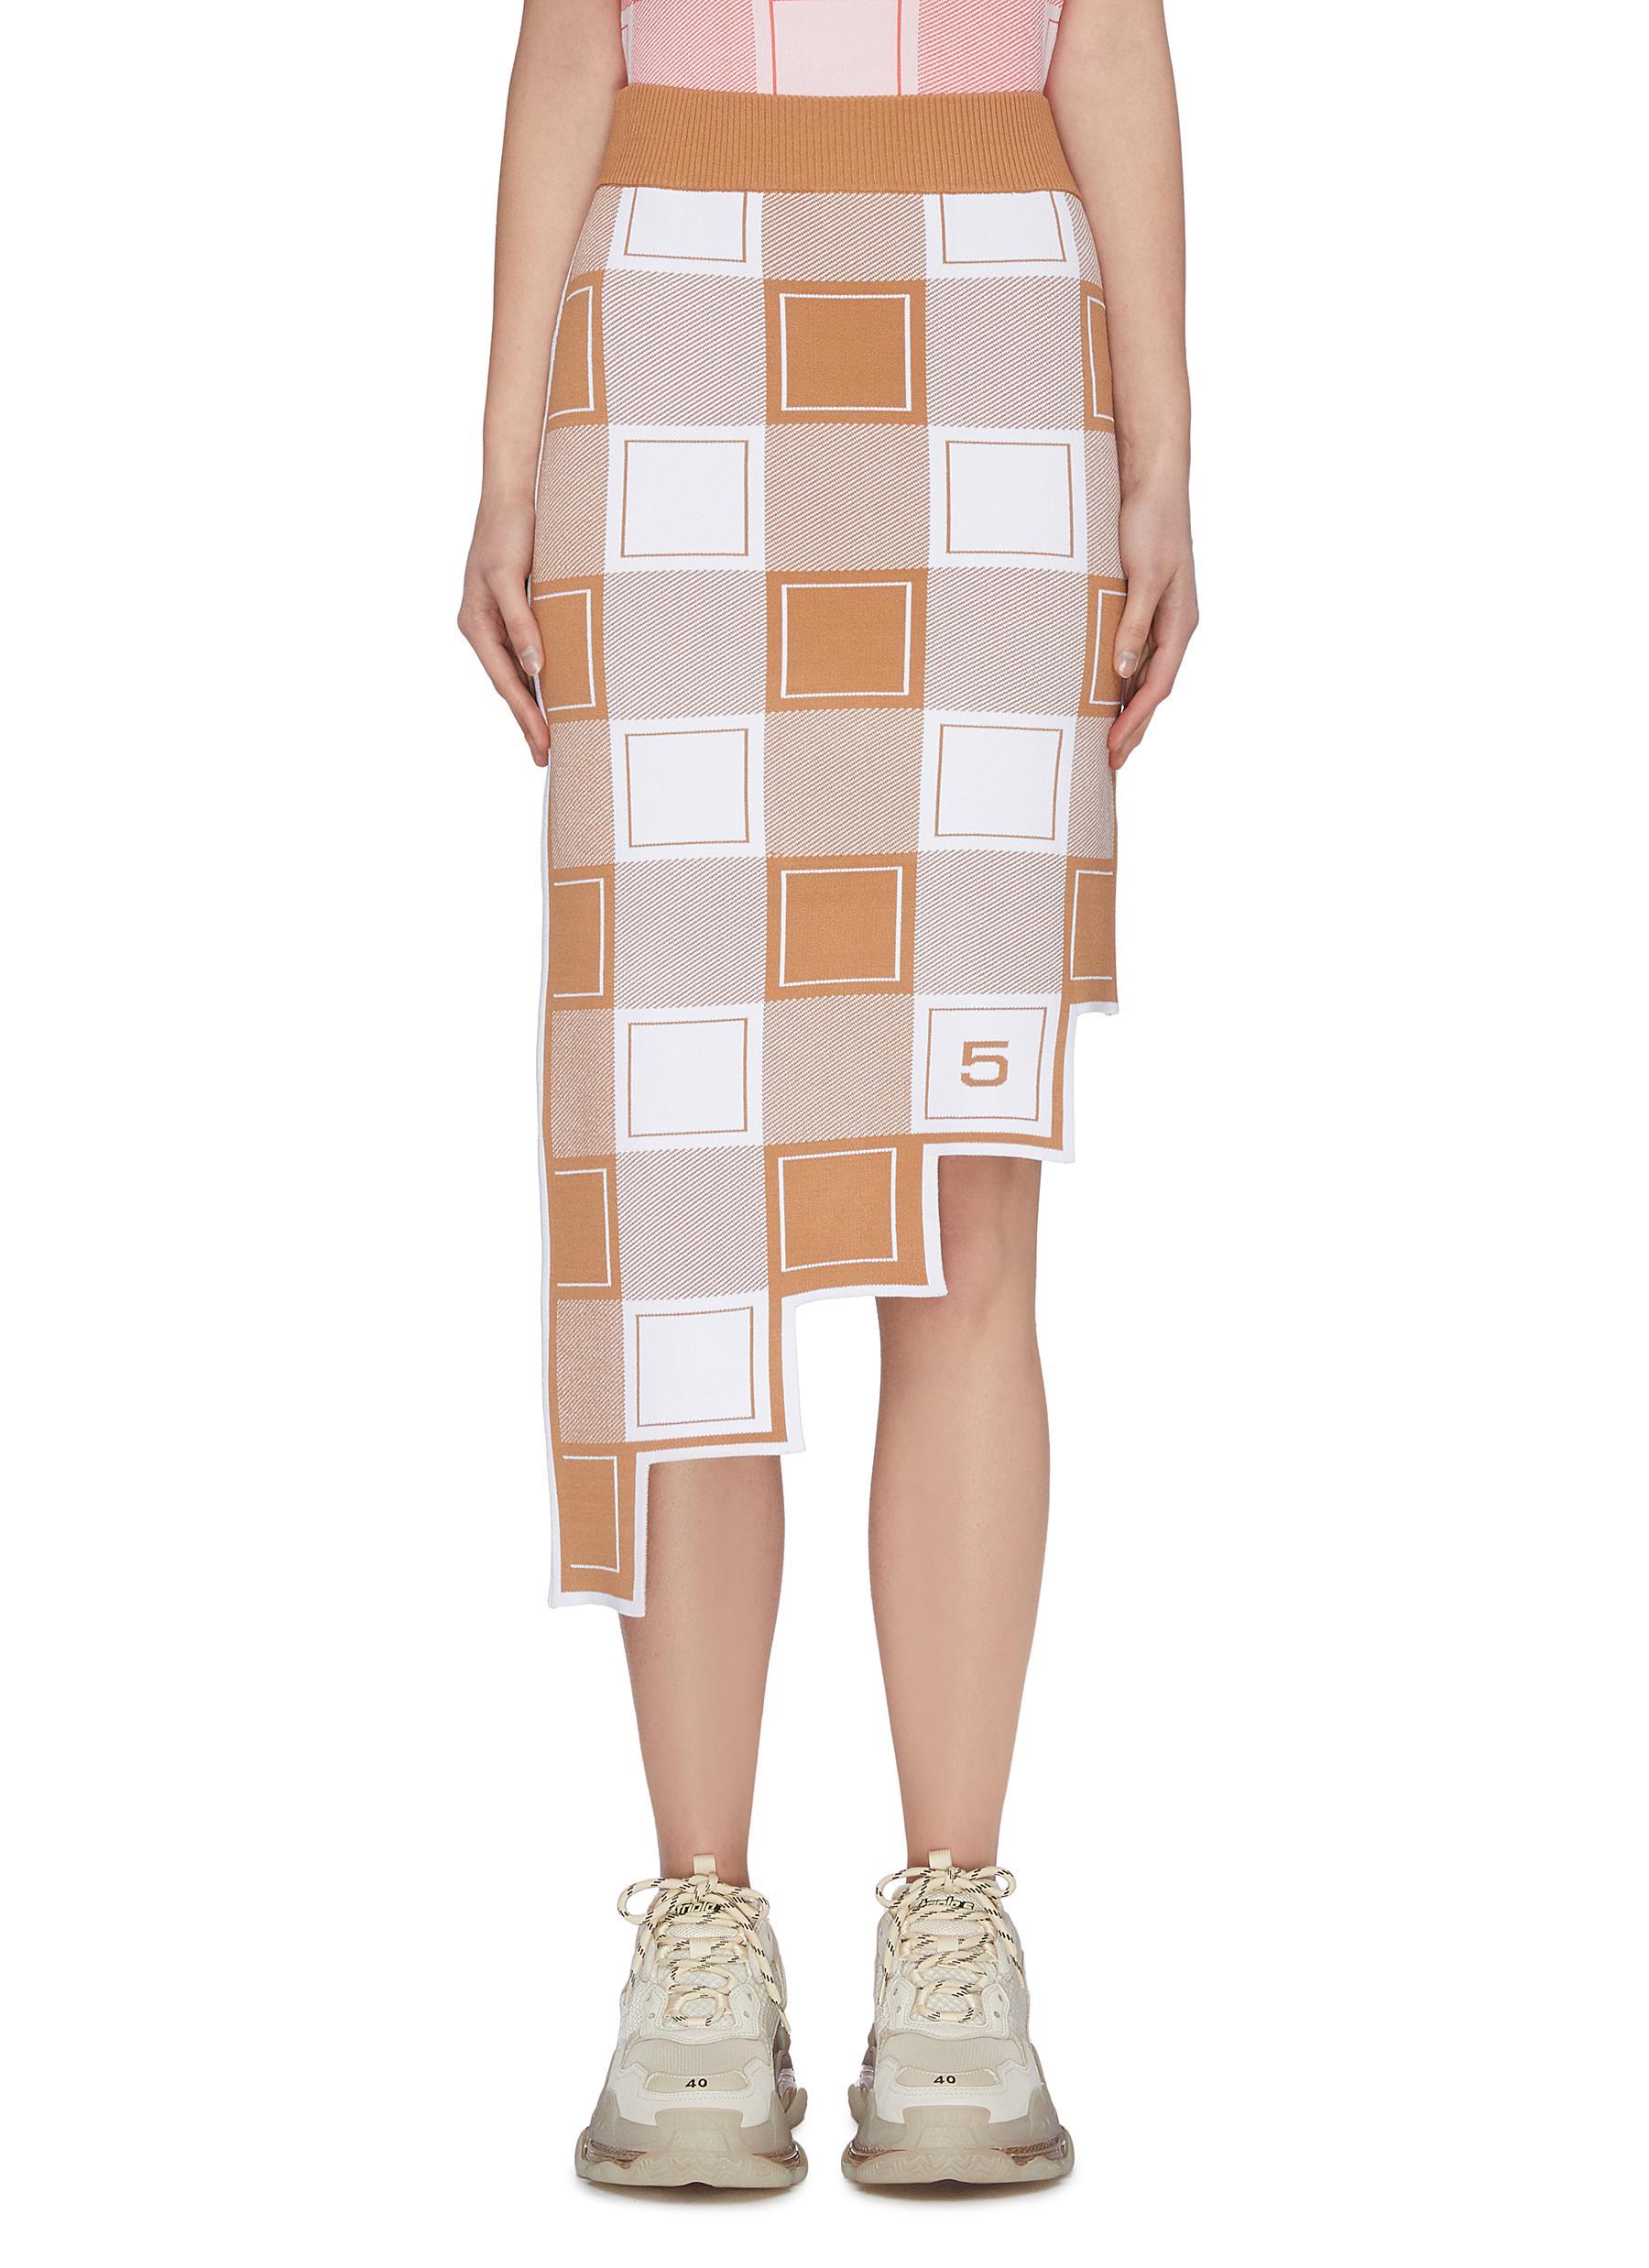 Buy Ph5 Skirts Cambridge' Asymmetric Check Pencil Skirt